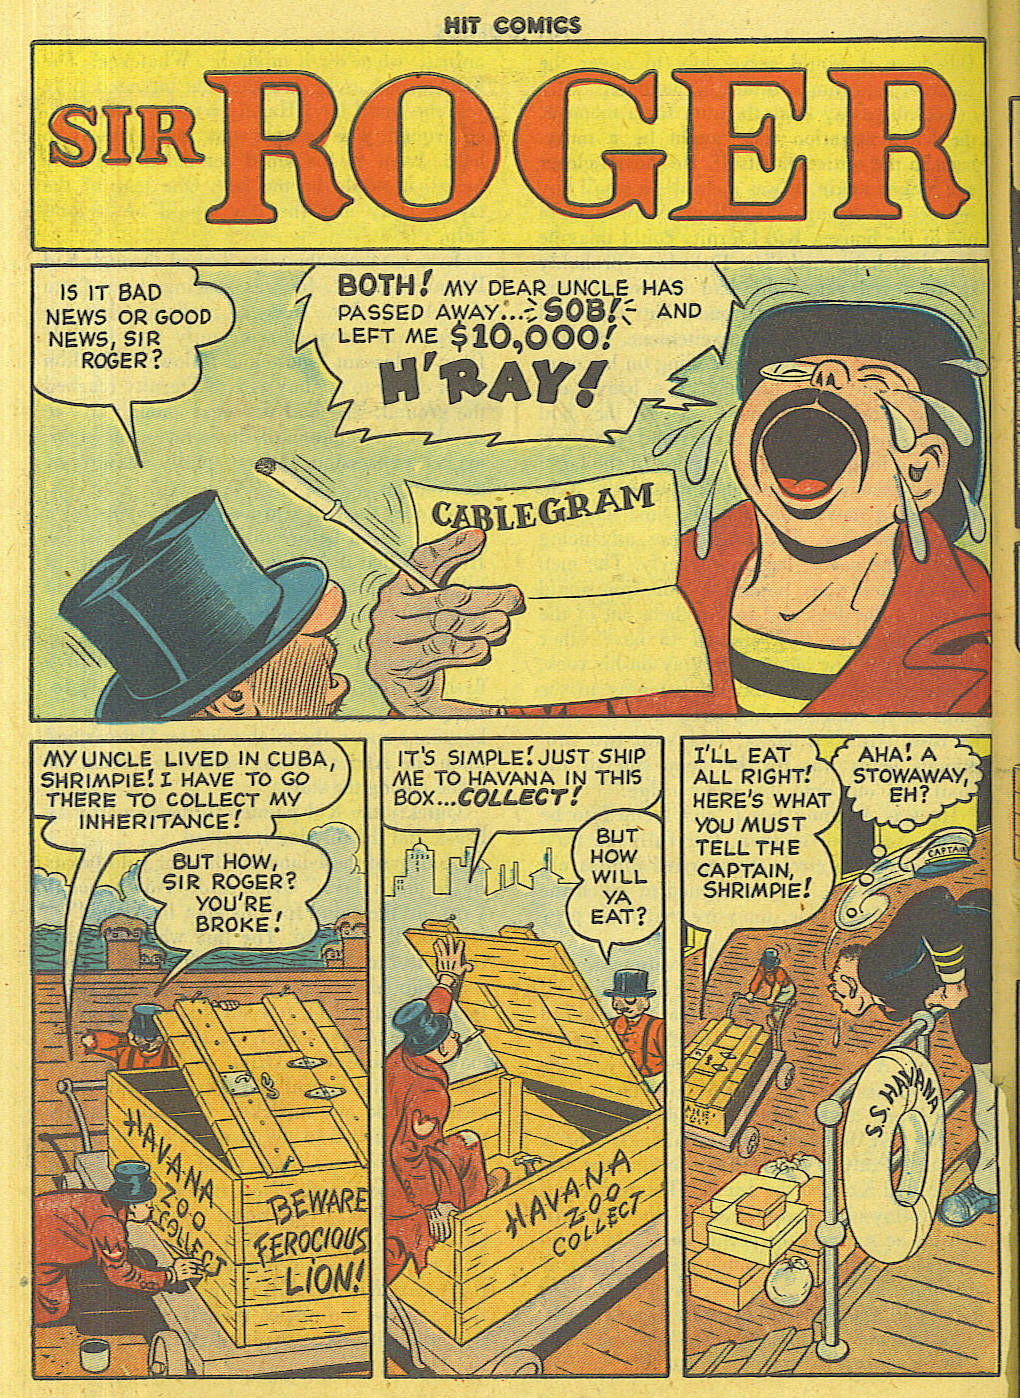 Read online Hit Comics comic -  Issue #56 - 38